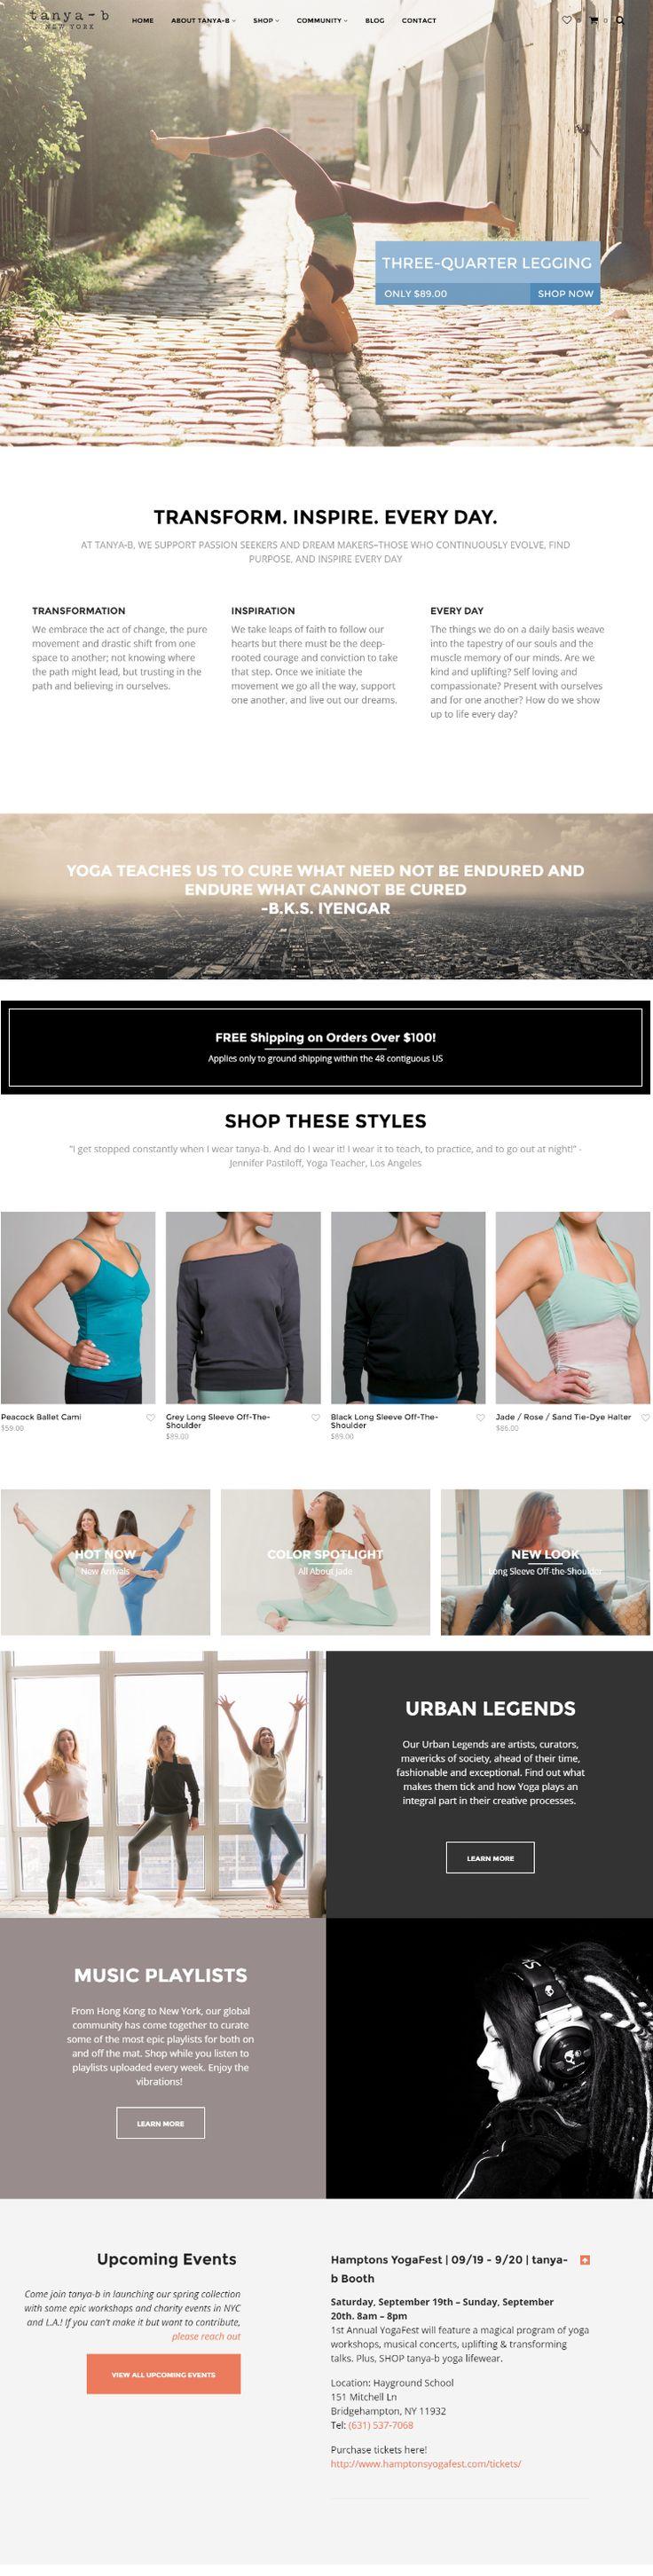 tanya-b.com was built with Shopkeeper WP Theme http://themeforest.net/item/shopkeeper-responsive-wordpress-theme/9553045?&utm_source=pinterest.com&utm_medium=social&utm_content=tanya-b&utm_campaign=showcase #wordpress #wordpresstheme #webdesign #yoga #yogawear #design